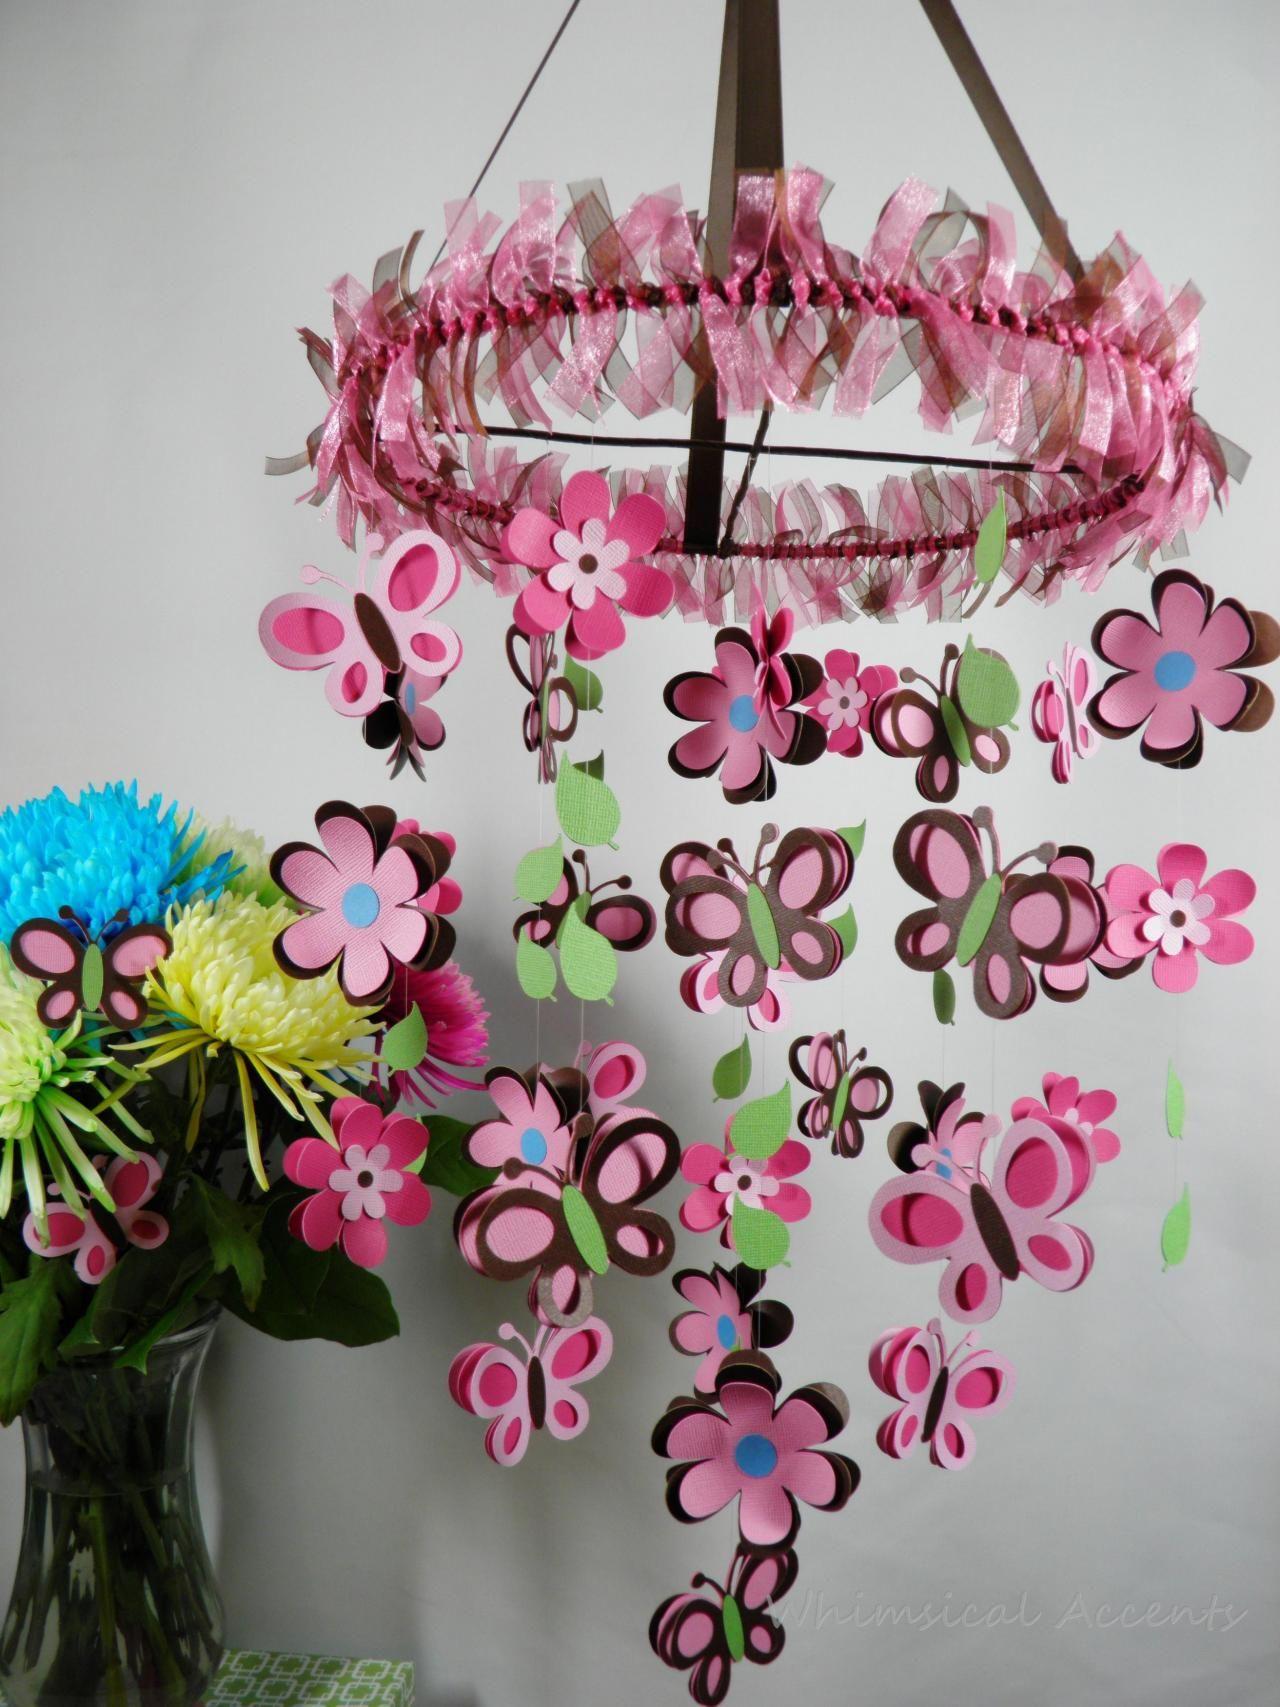 Flower butterfly and leaf nursery mobile eva sinos de vento artesanato mobiles de beb e - Manualidades para decorar habitacion ...